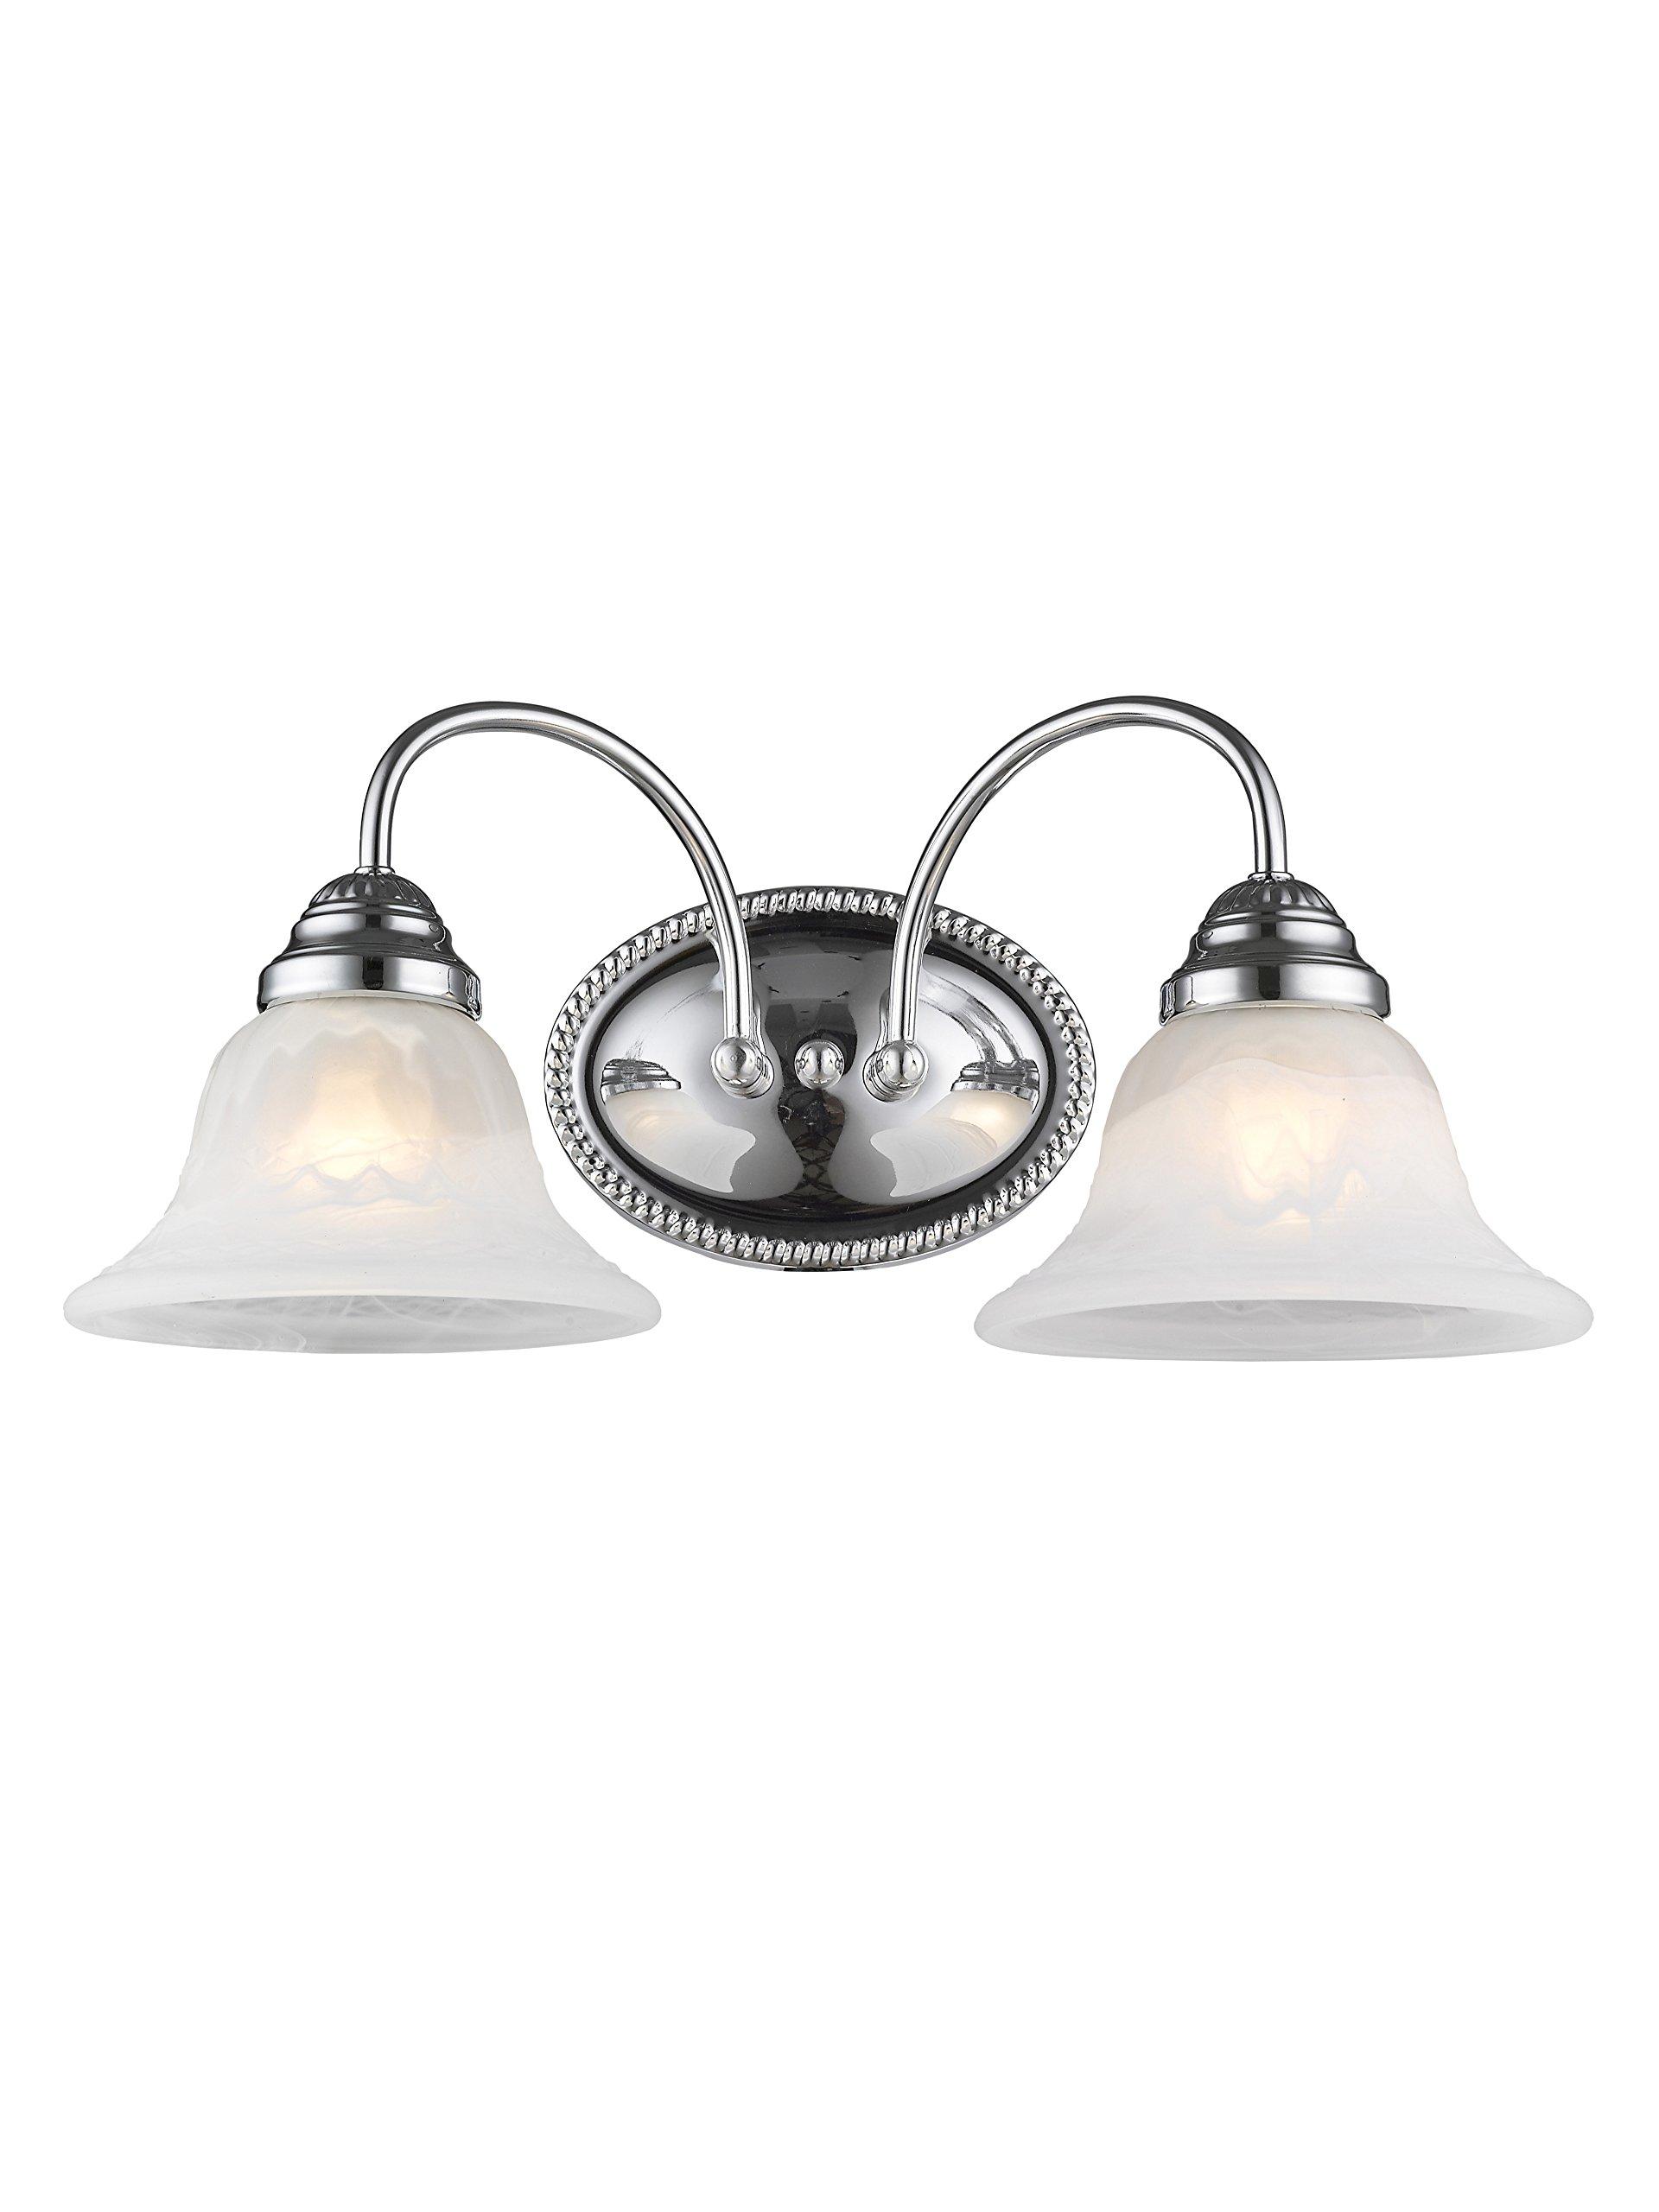 Livex Lighting 1532-05 Edgemont 2 Light Wall Sconce Chrome with White Alabaster Glass